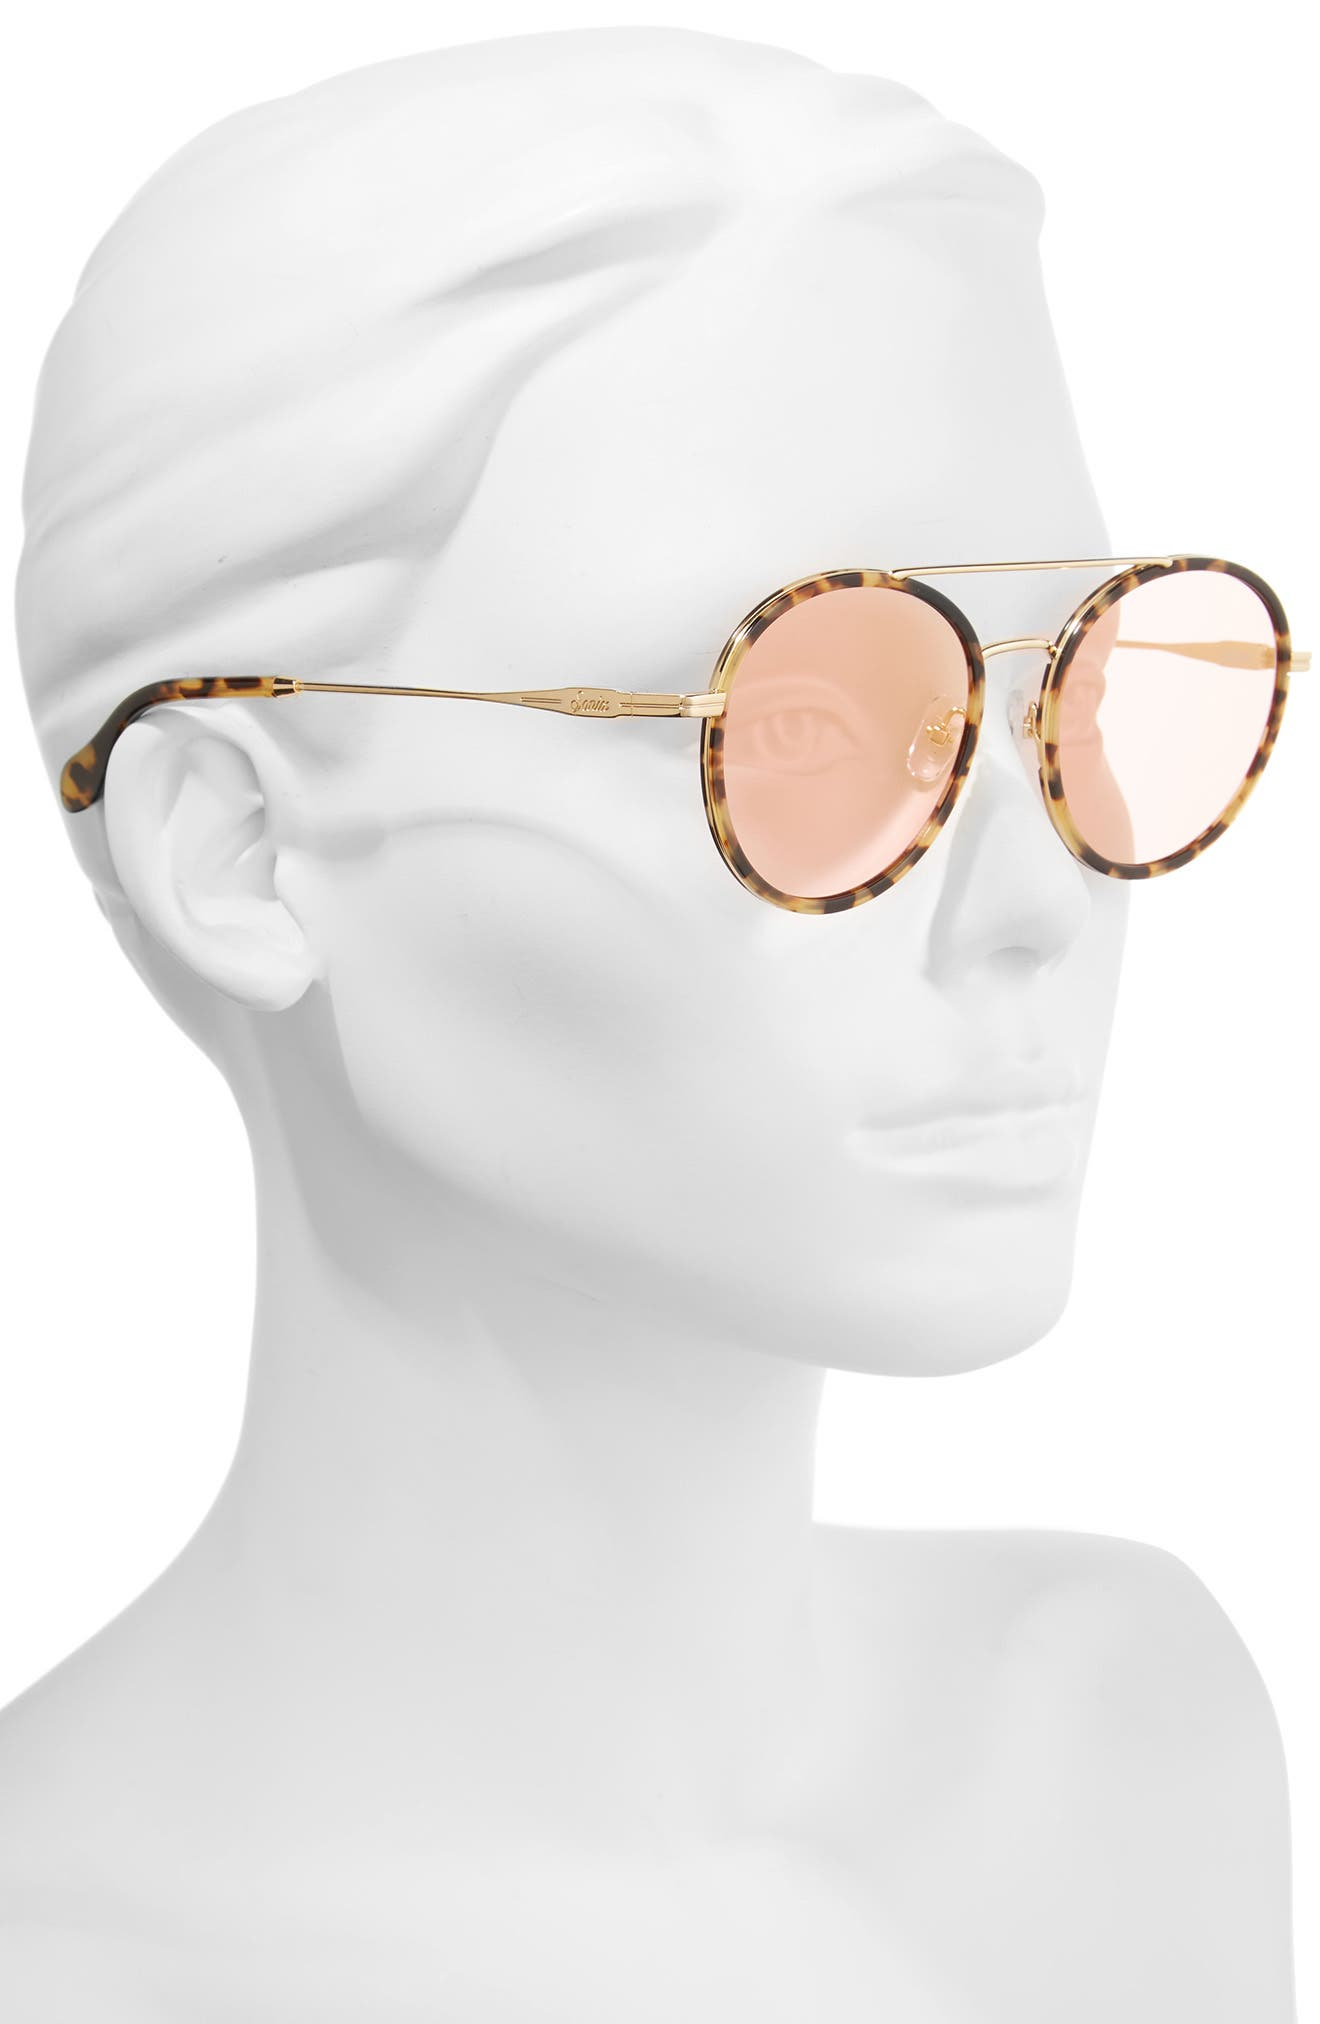 Charli 50mm Mirrored Lens Round Sunglasses,                             Alternate thumbnail 8, color,